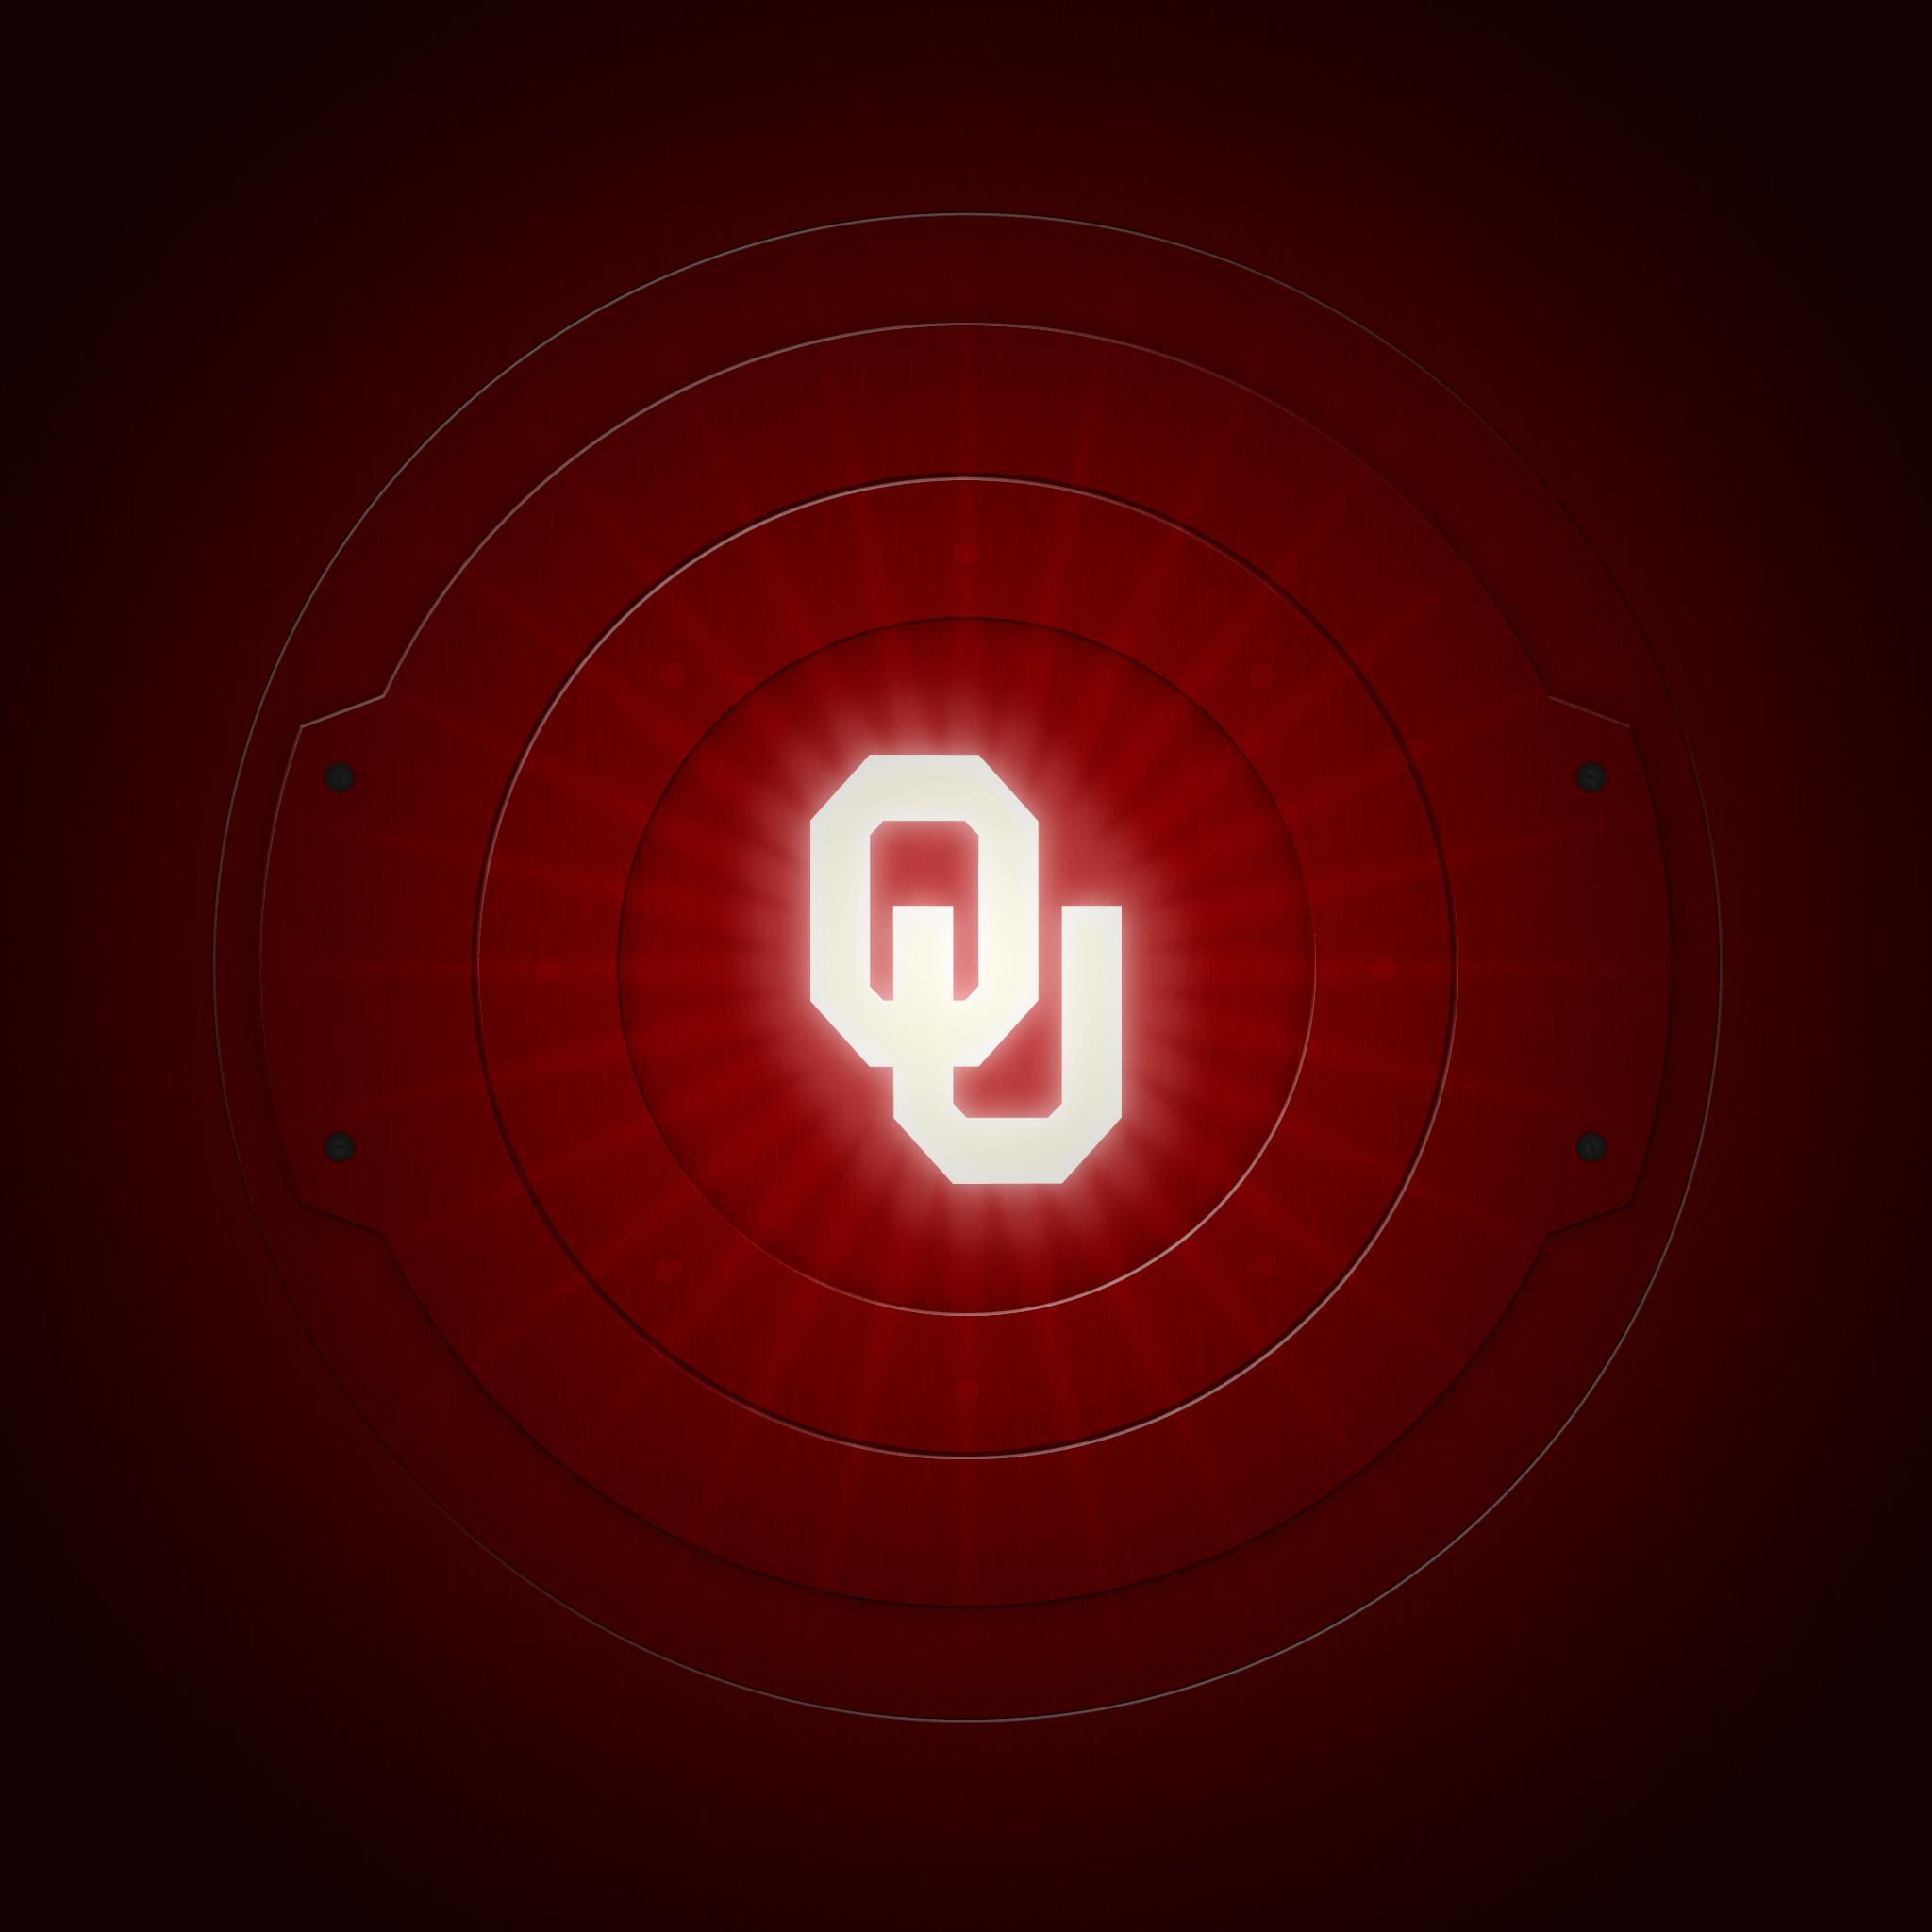 Oklahoma Sooners Wallpaper Ipad ou powerup iphone 5 2048x2048